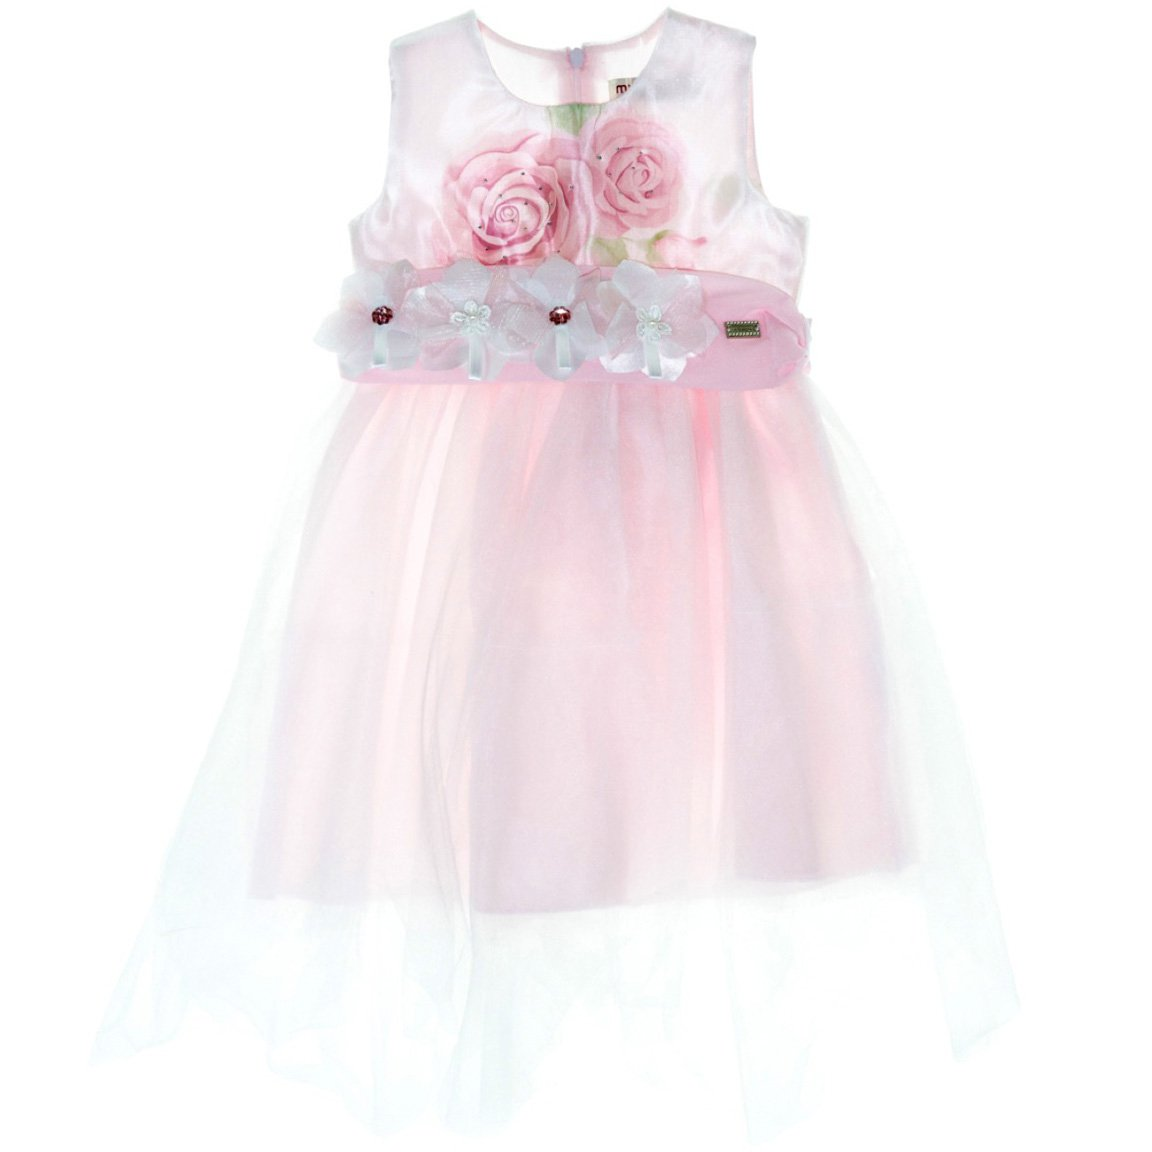 76378d3a100c Δείτε το εδώ   http   www.azshop.gr item Ebita-paidiko-ampigie-forema-Delicate-Roses   …pic.twitter.com z8Zbfmphd8